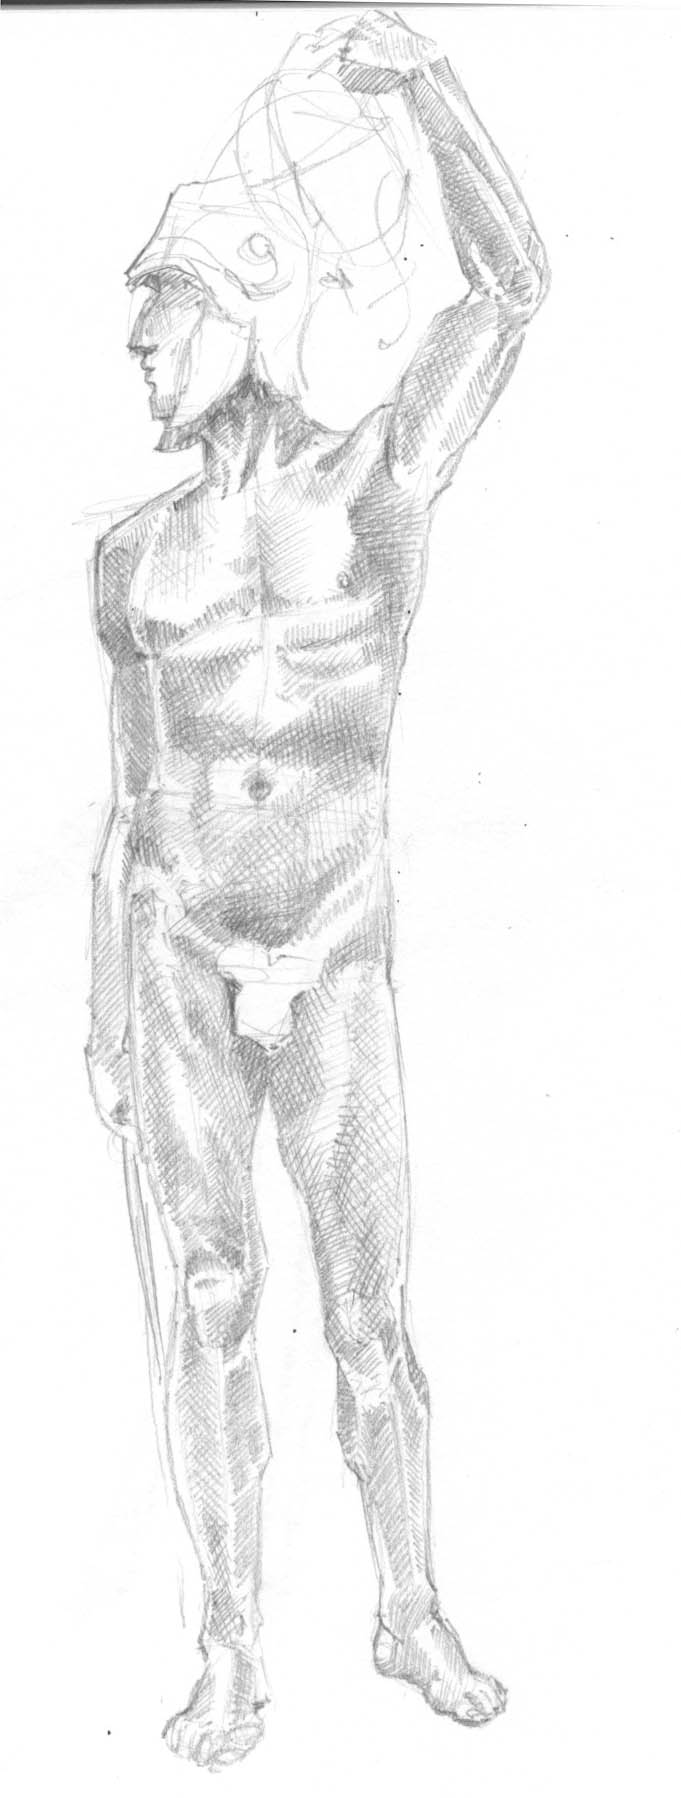 pencil sketch of sculpture of Perseus holding Medusa's head aloft